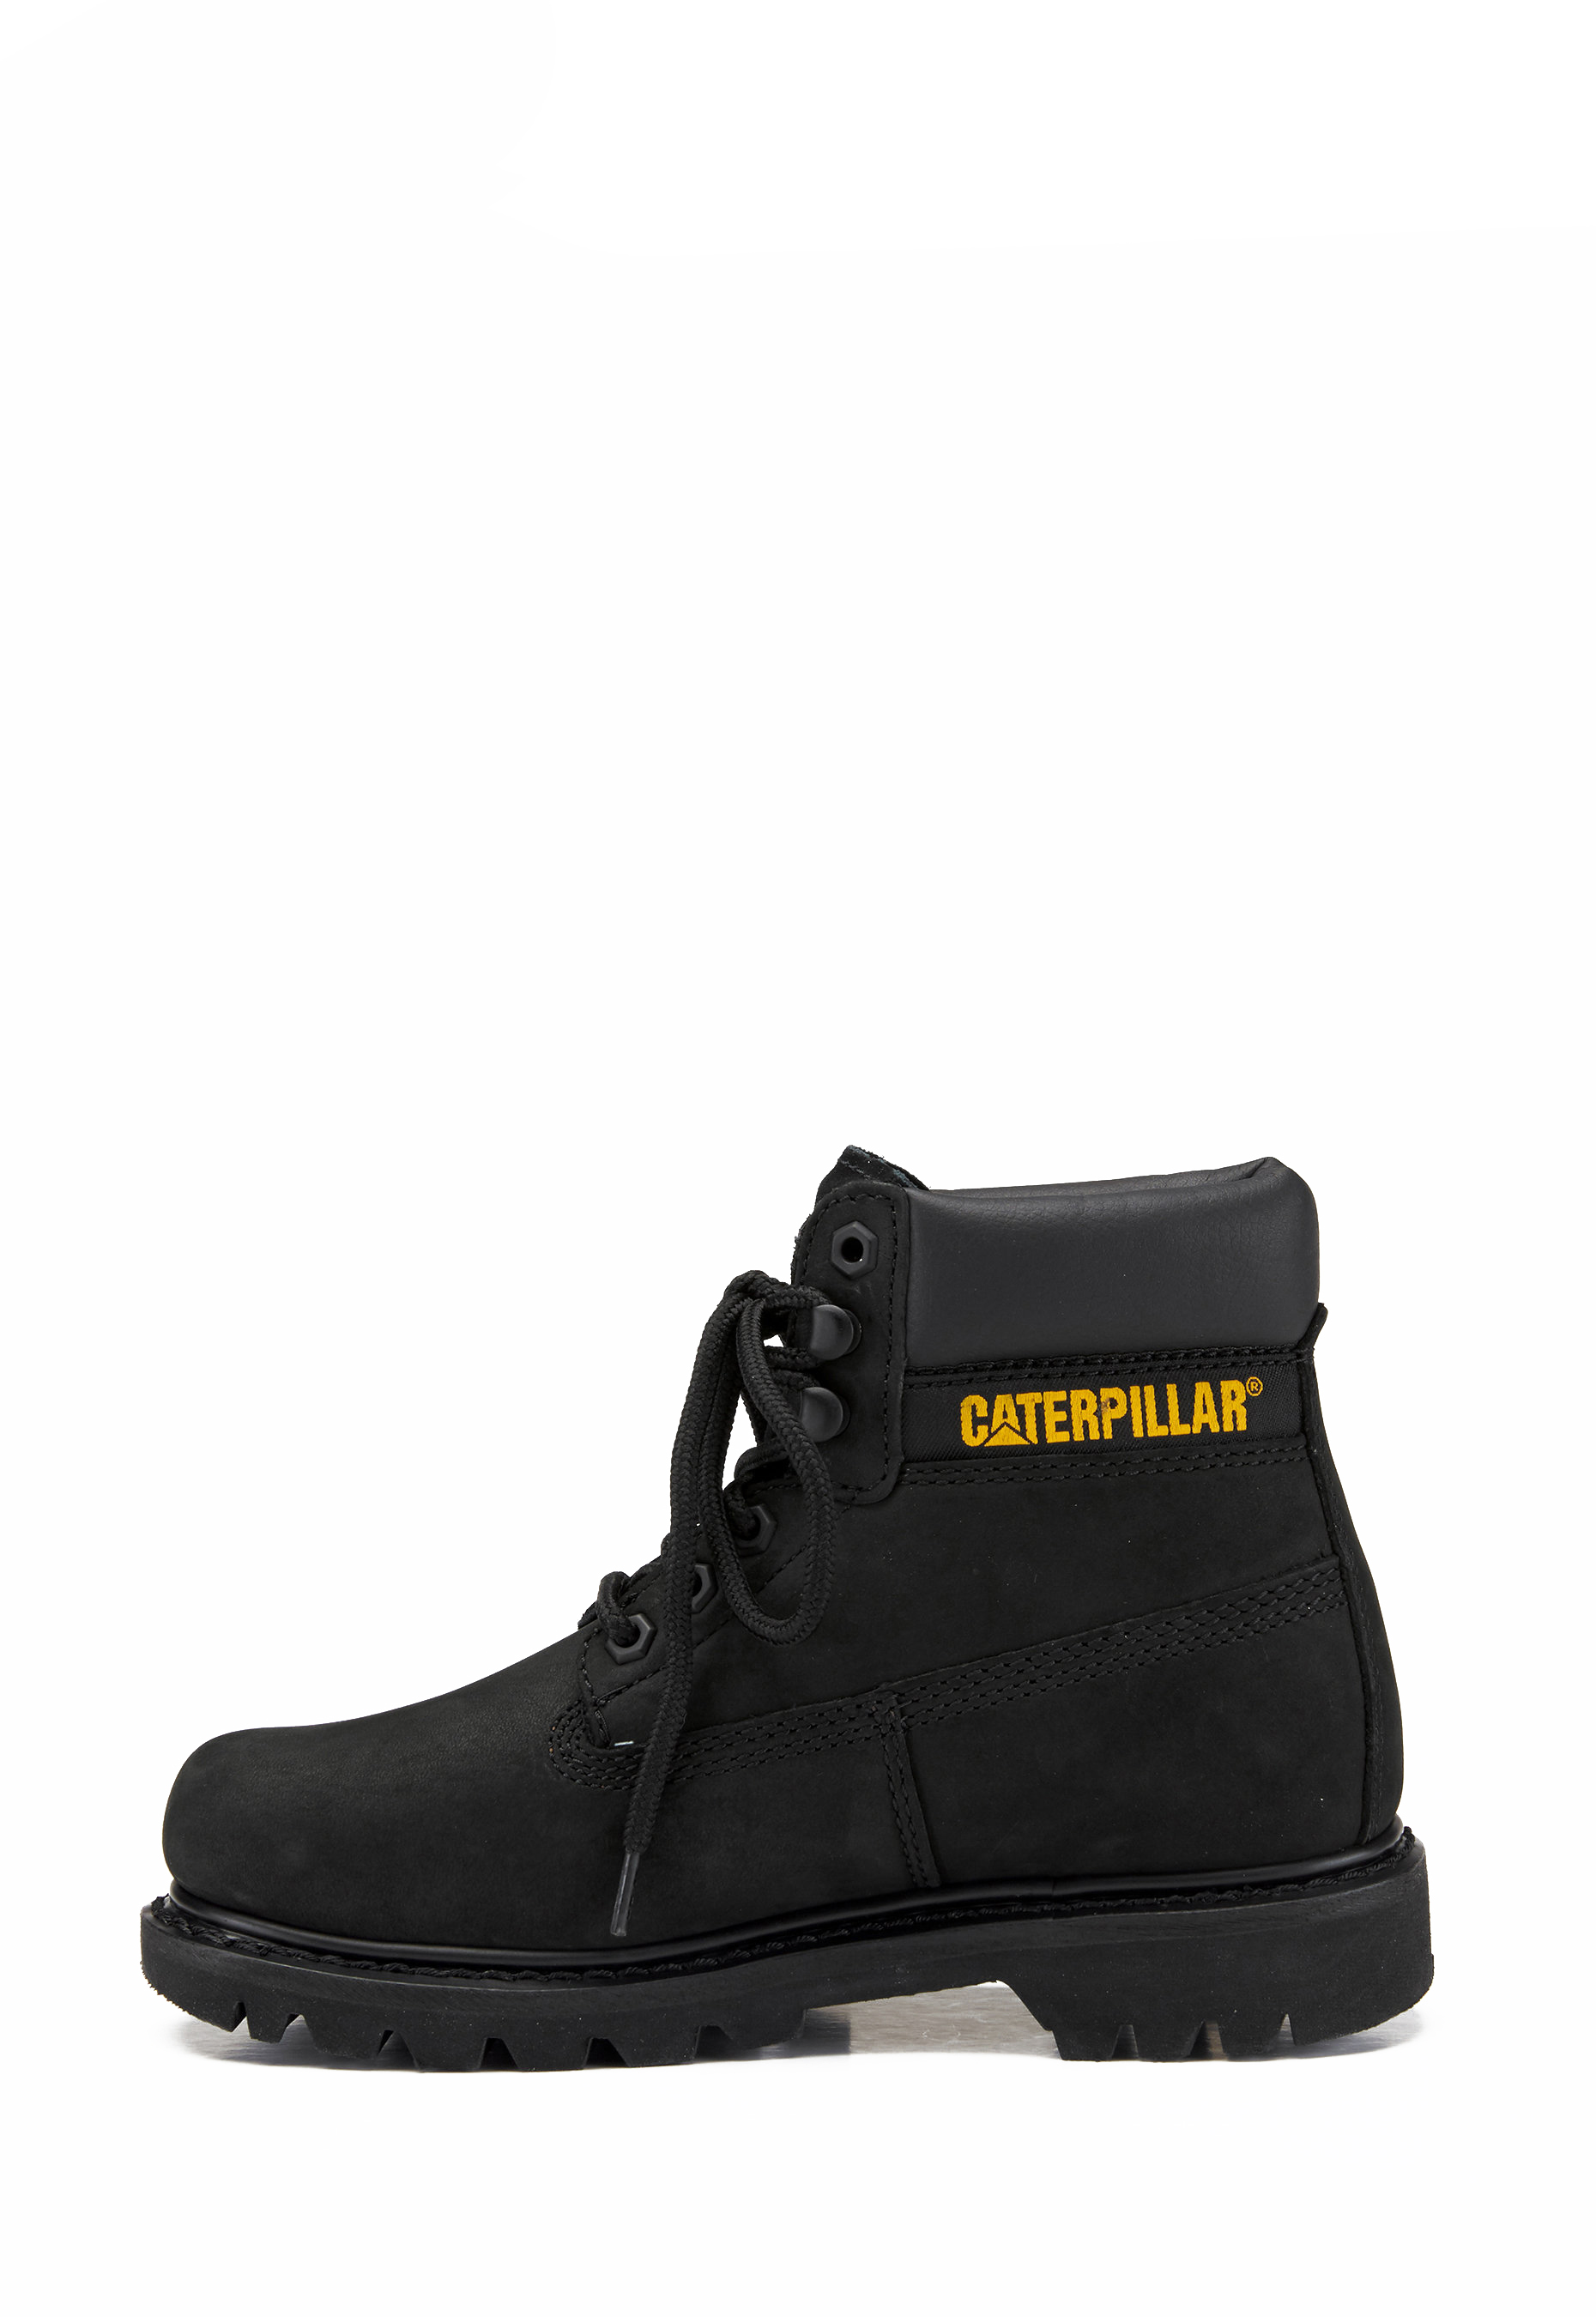 Fabriksnye Caterpillar Colorado Boot Black - Bubbleroom GE-49